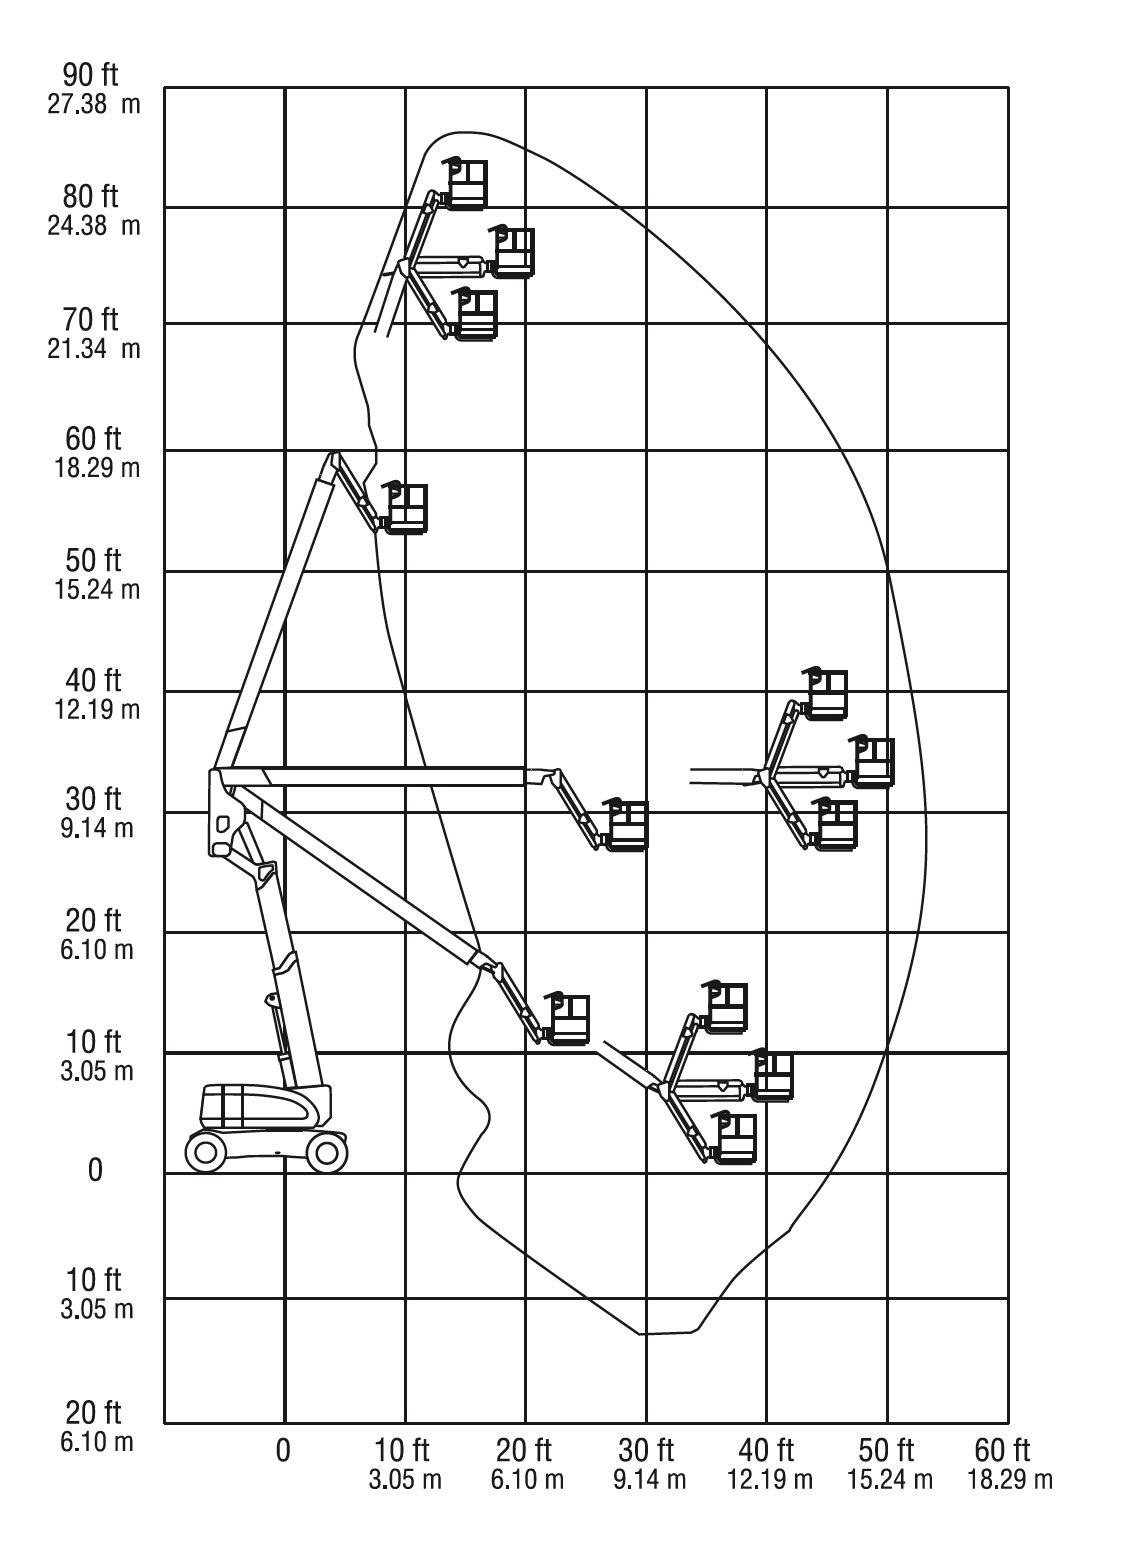 JLG H800AJ Articulating Boom Lift Reach Diagram